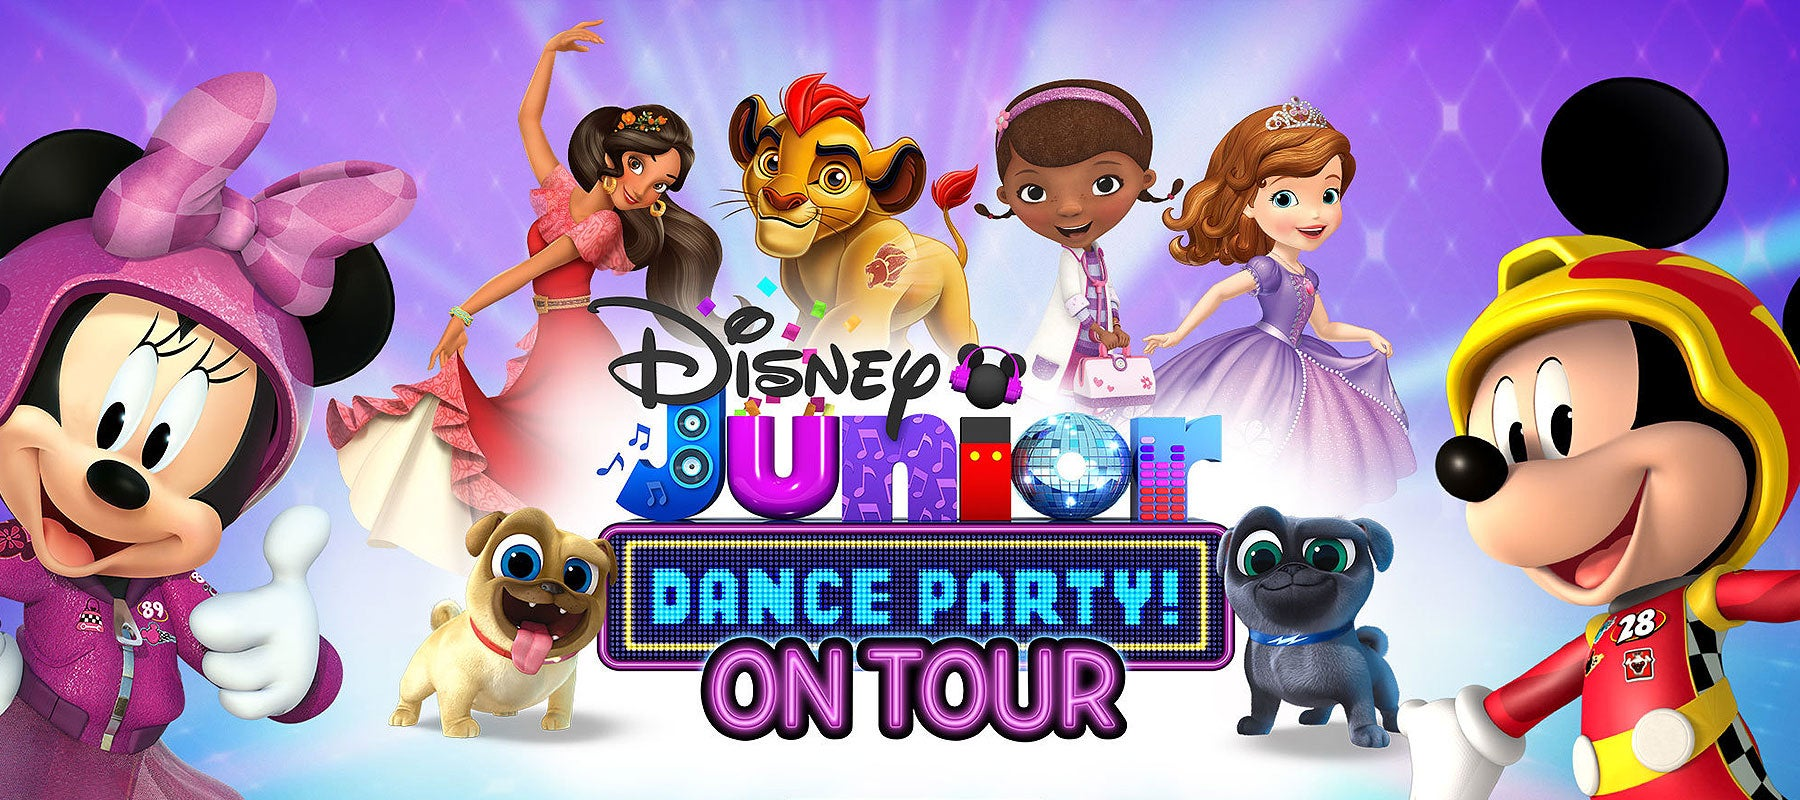 DisneyJunior-Dance-Slide.jpg